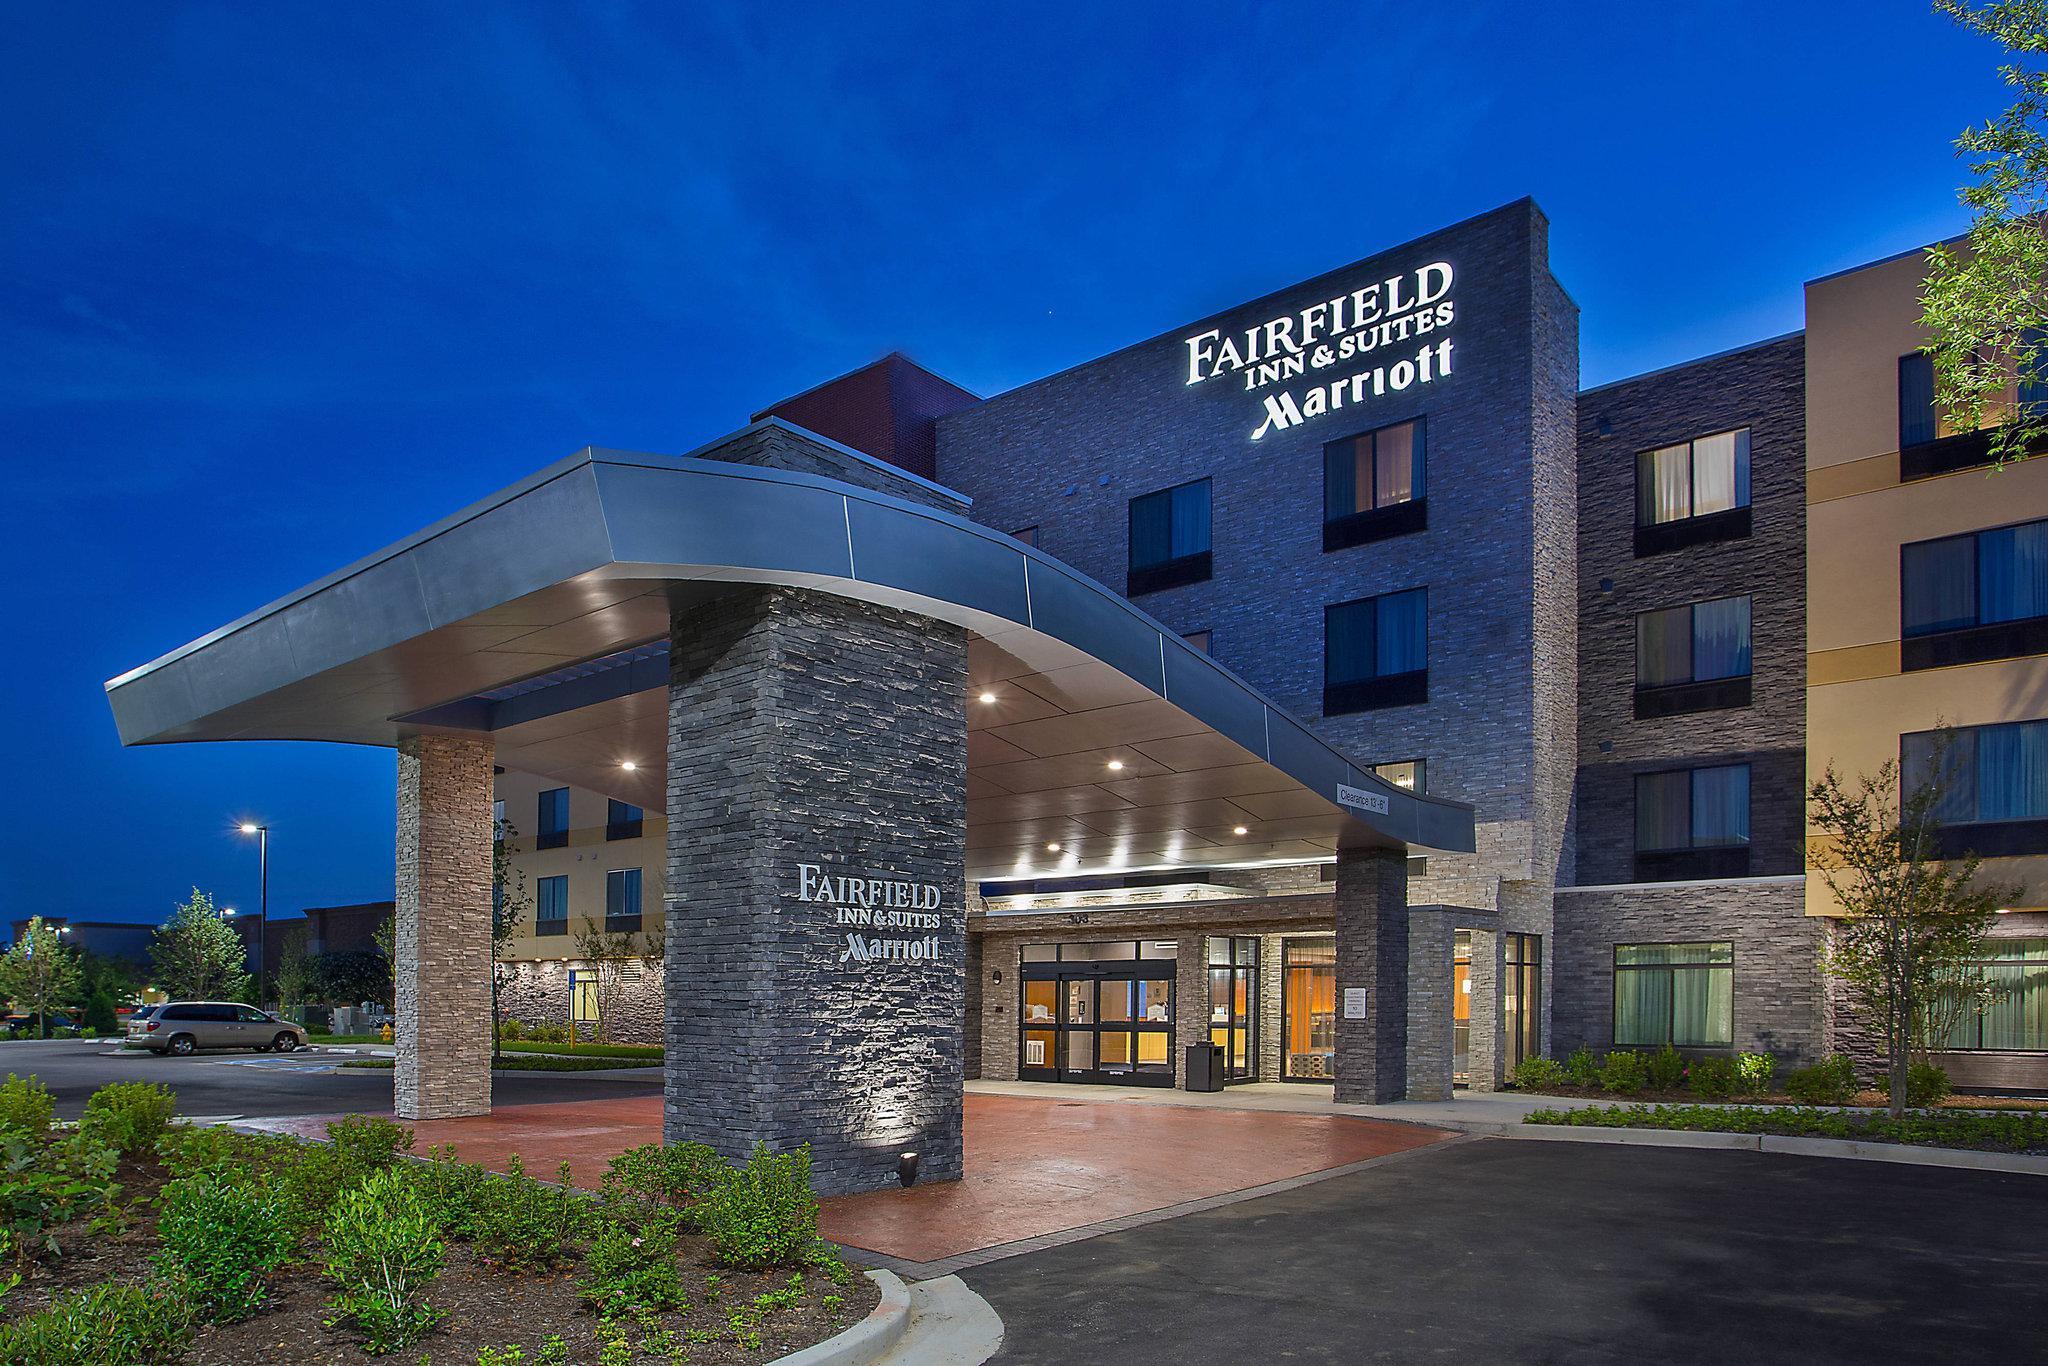 Fairfield Inn & Suites Nashville Hendersonville